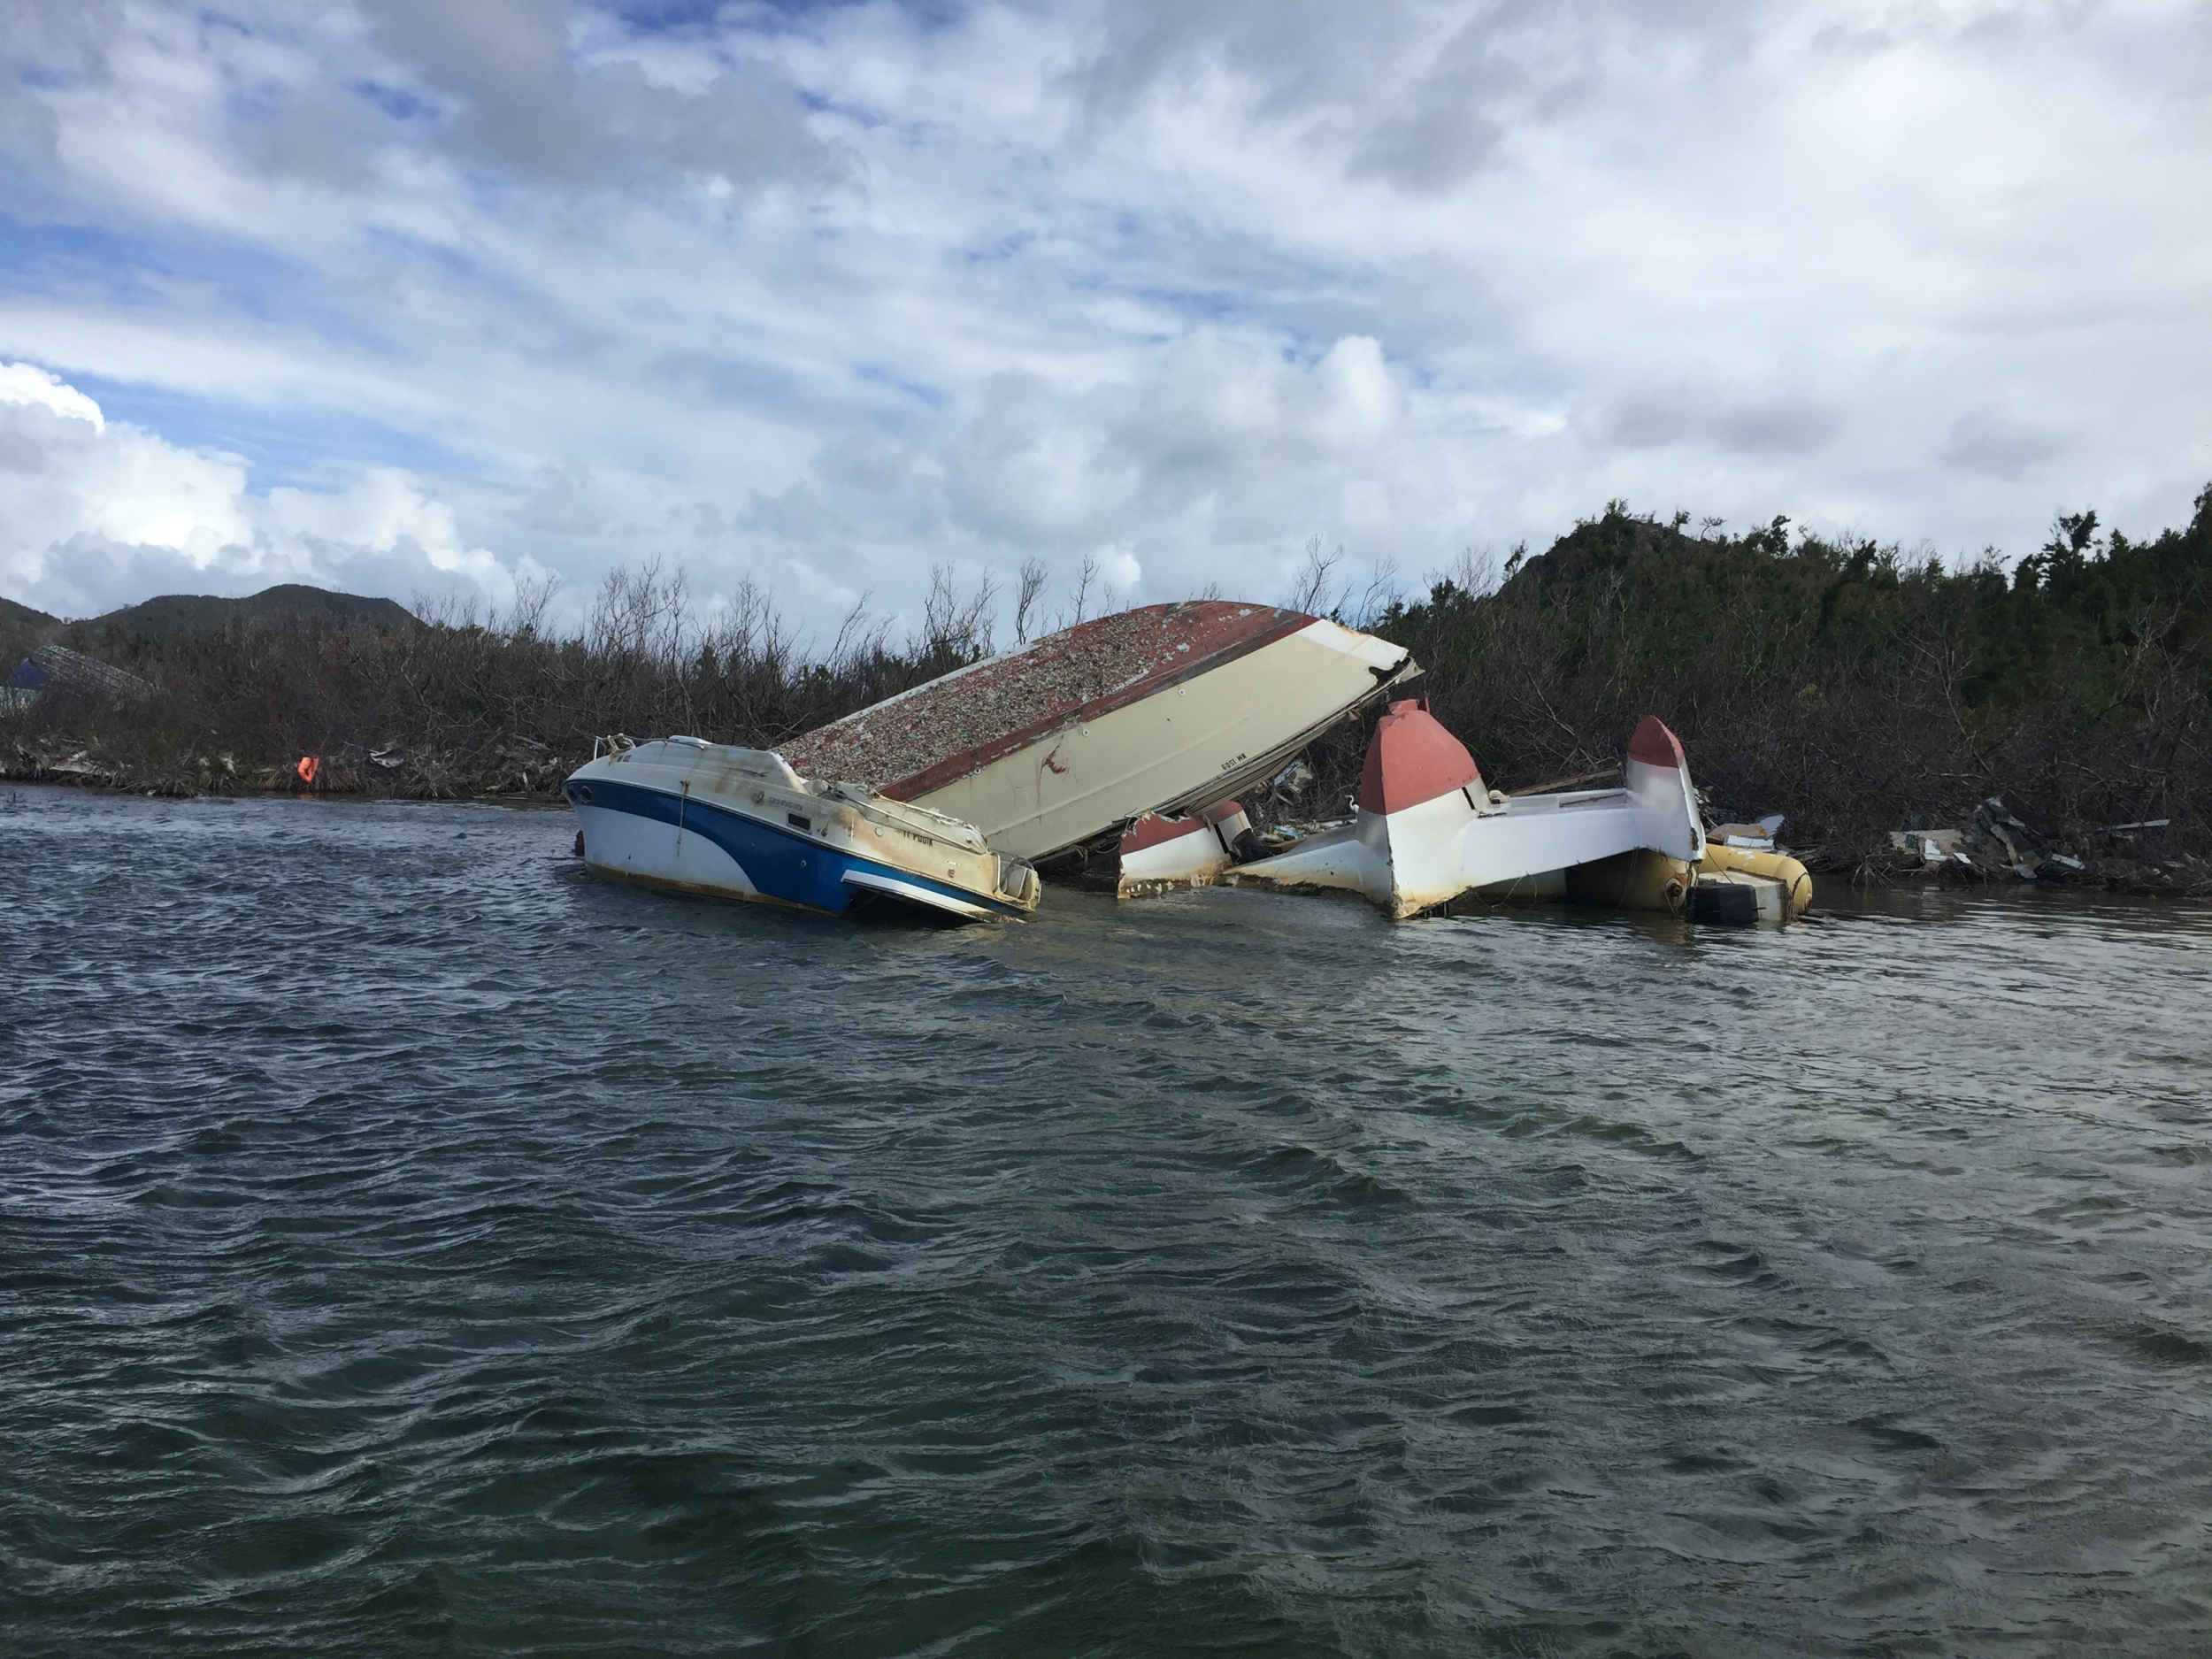 18. More Irma damage